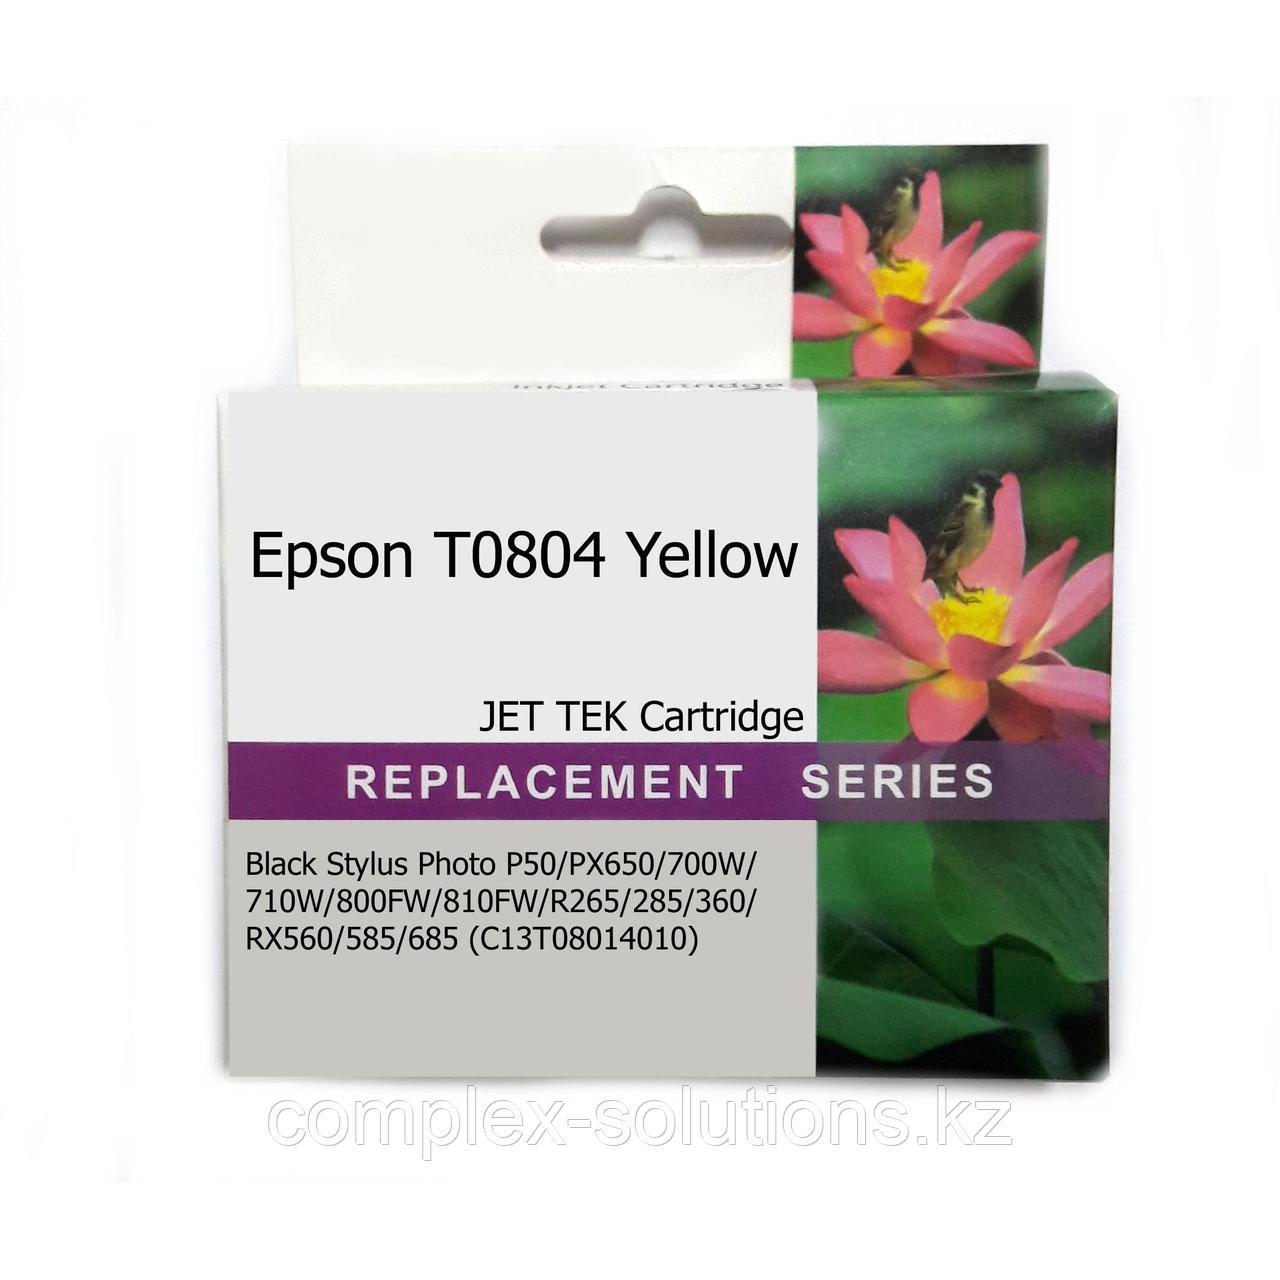 Картридж EPSON T0804 Yellow JET TEK | [качественный дубликат]